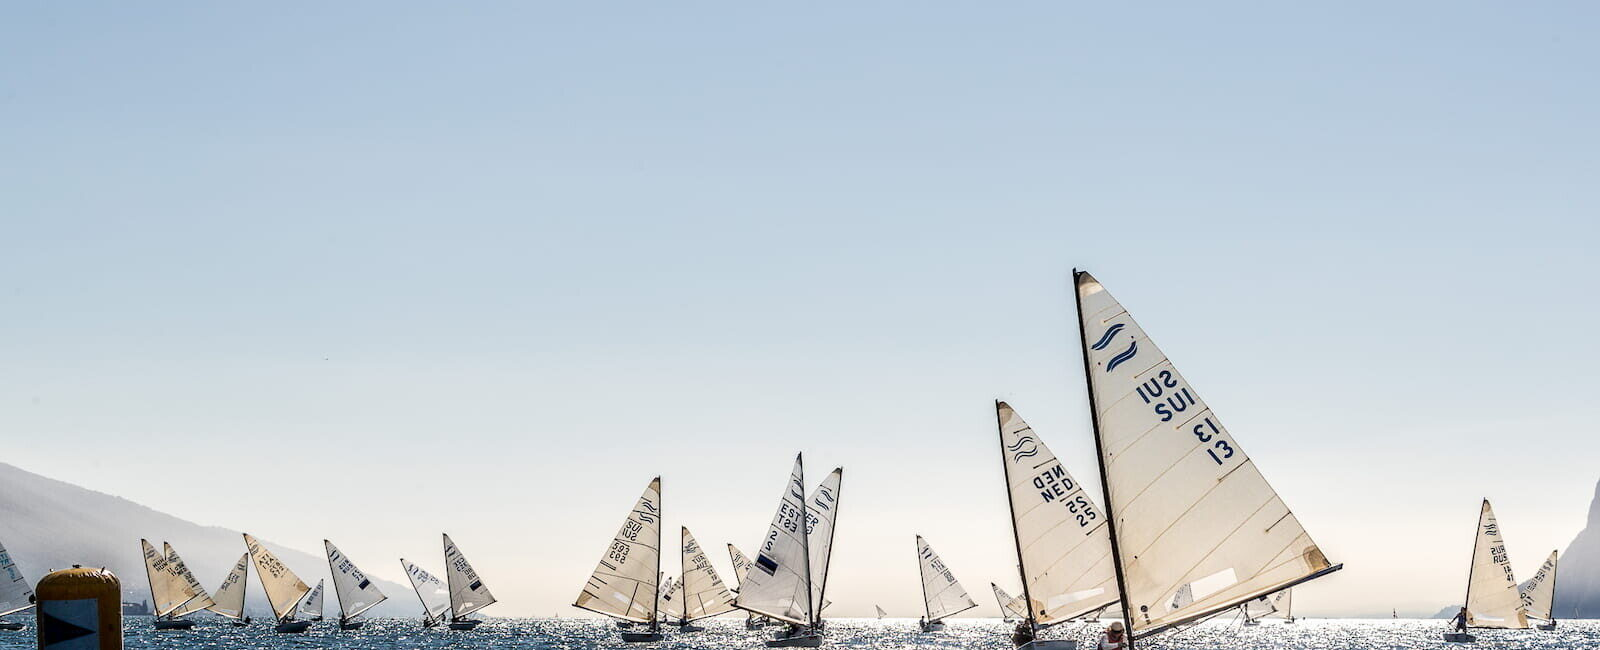 Regata Finn Cup Lago di Garda: Fraglia Vela Malcesine